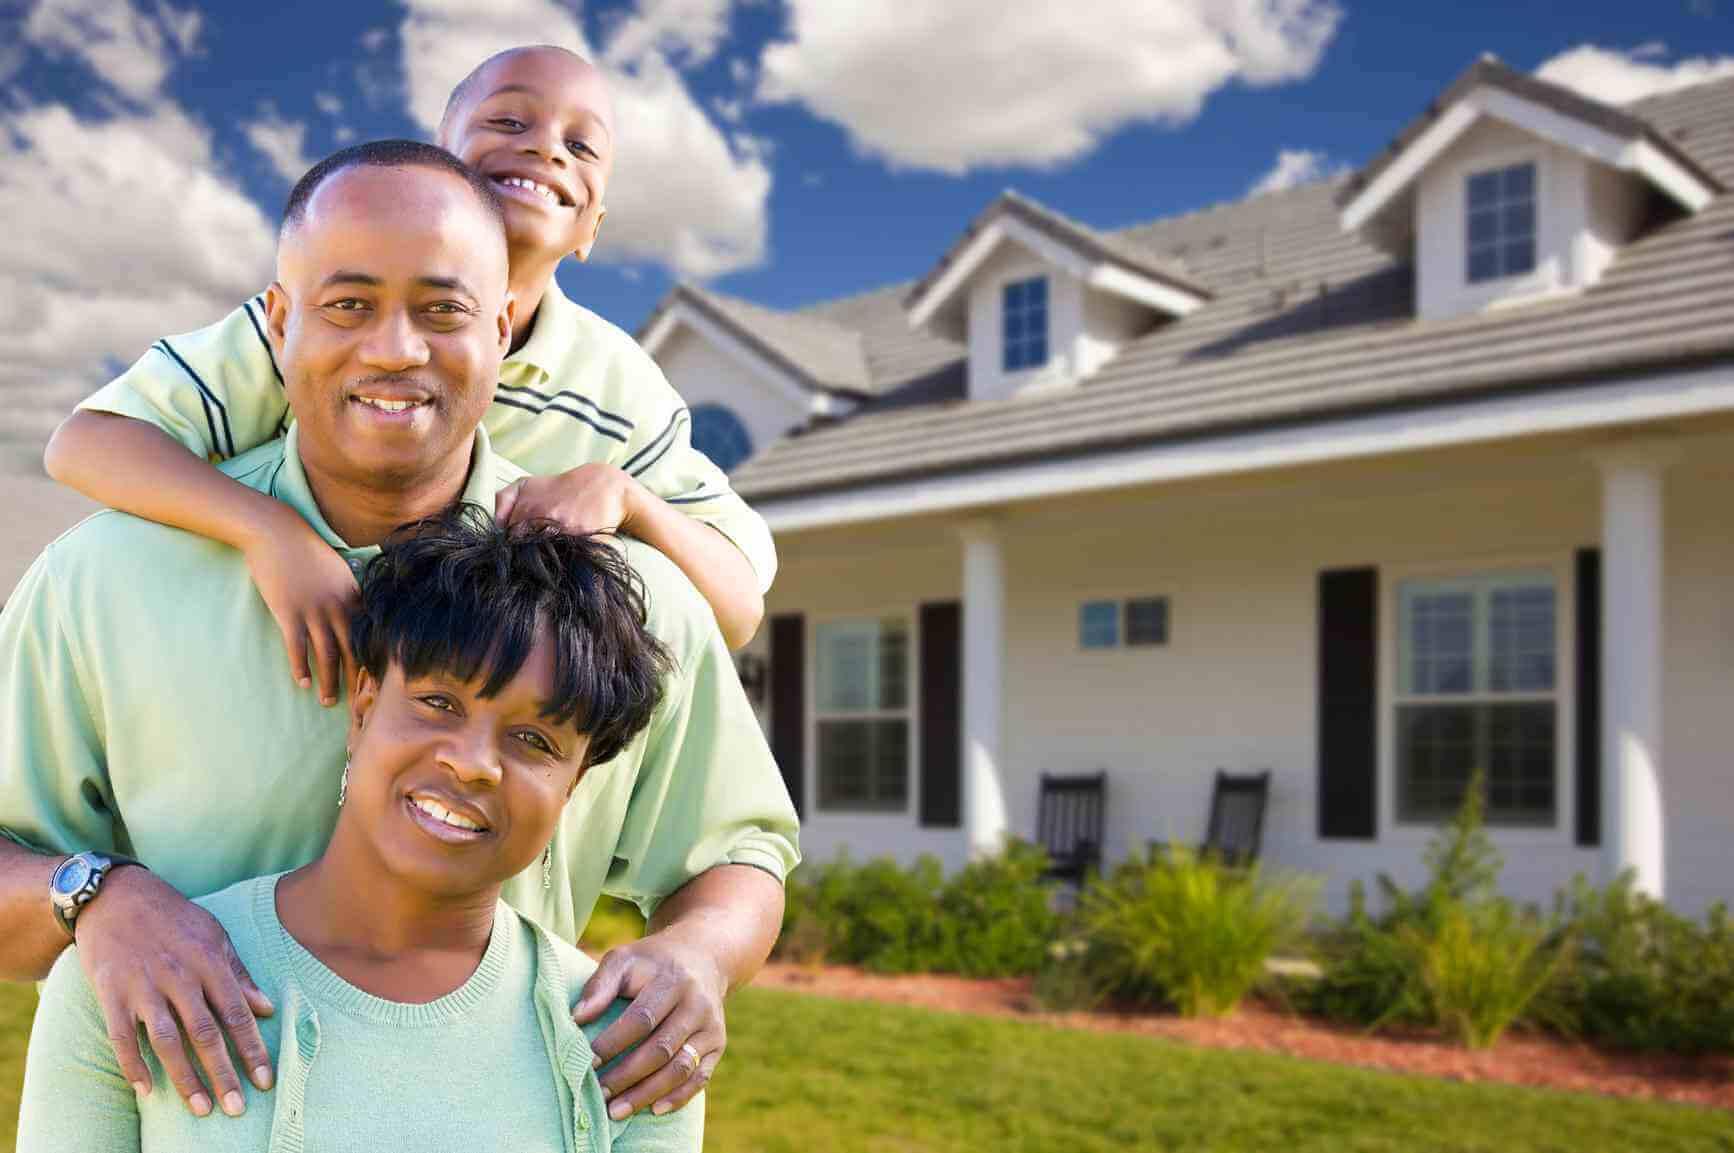 homeowners insurance checklist insurance savings tips hanuschak